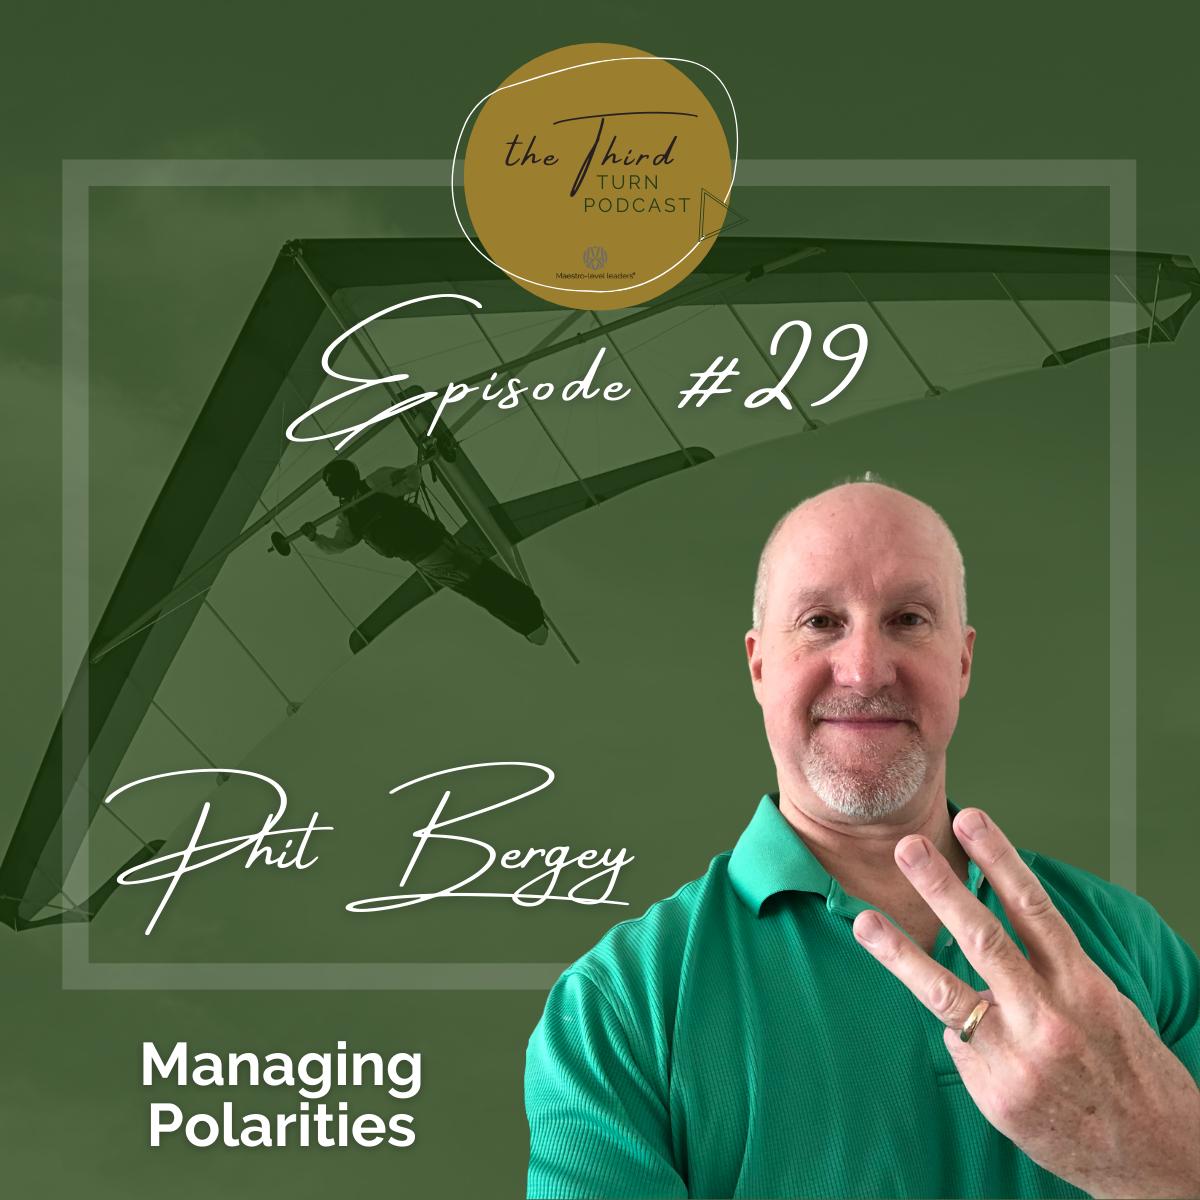 Phil Bergey - Episode 29